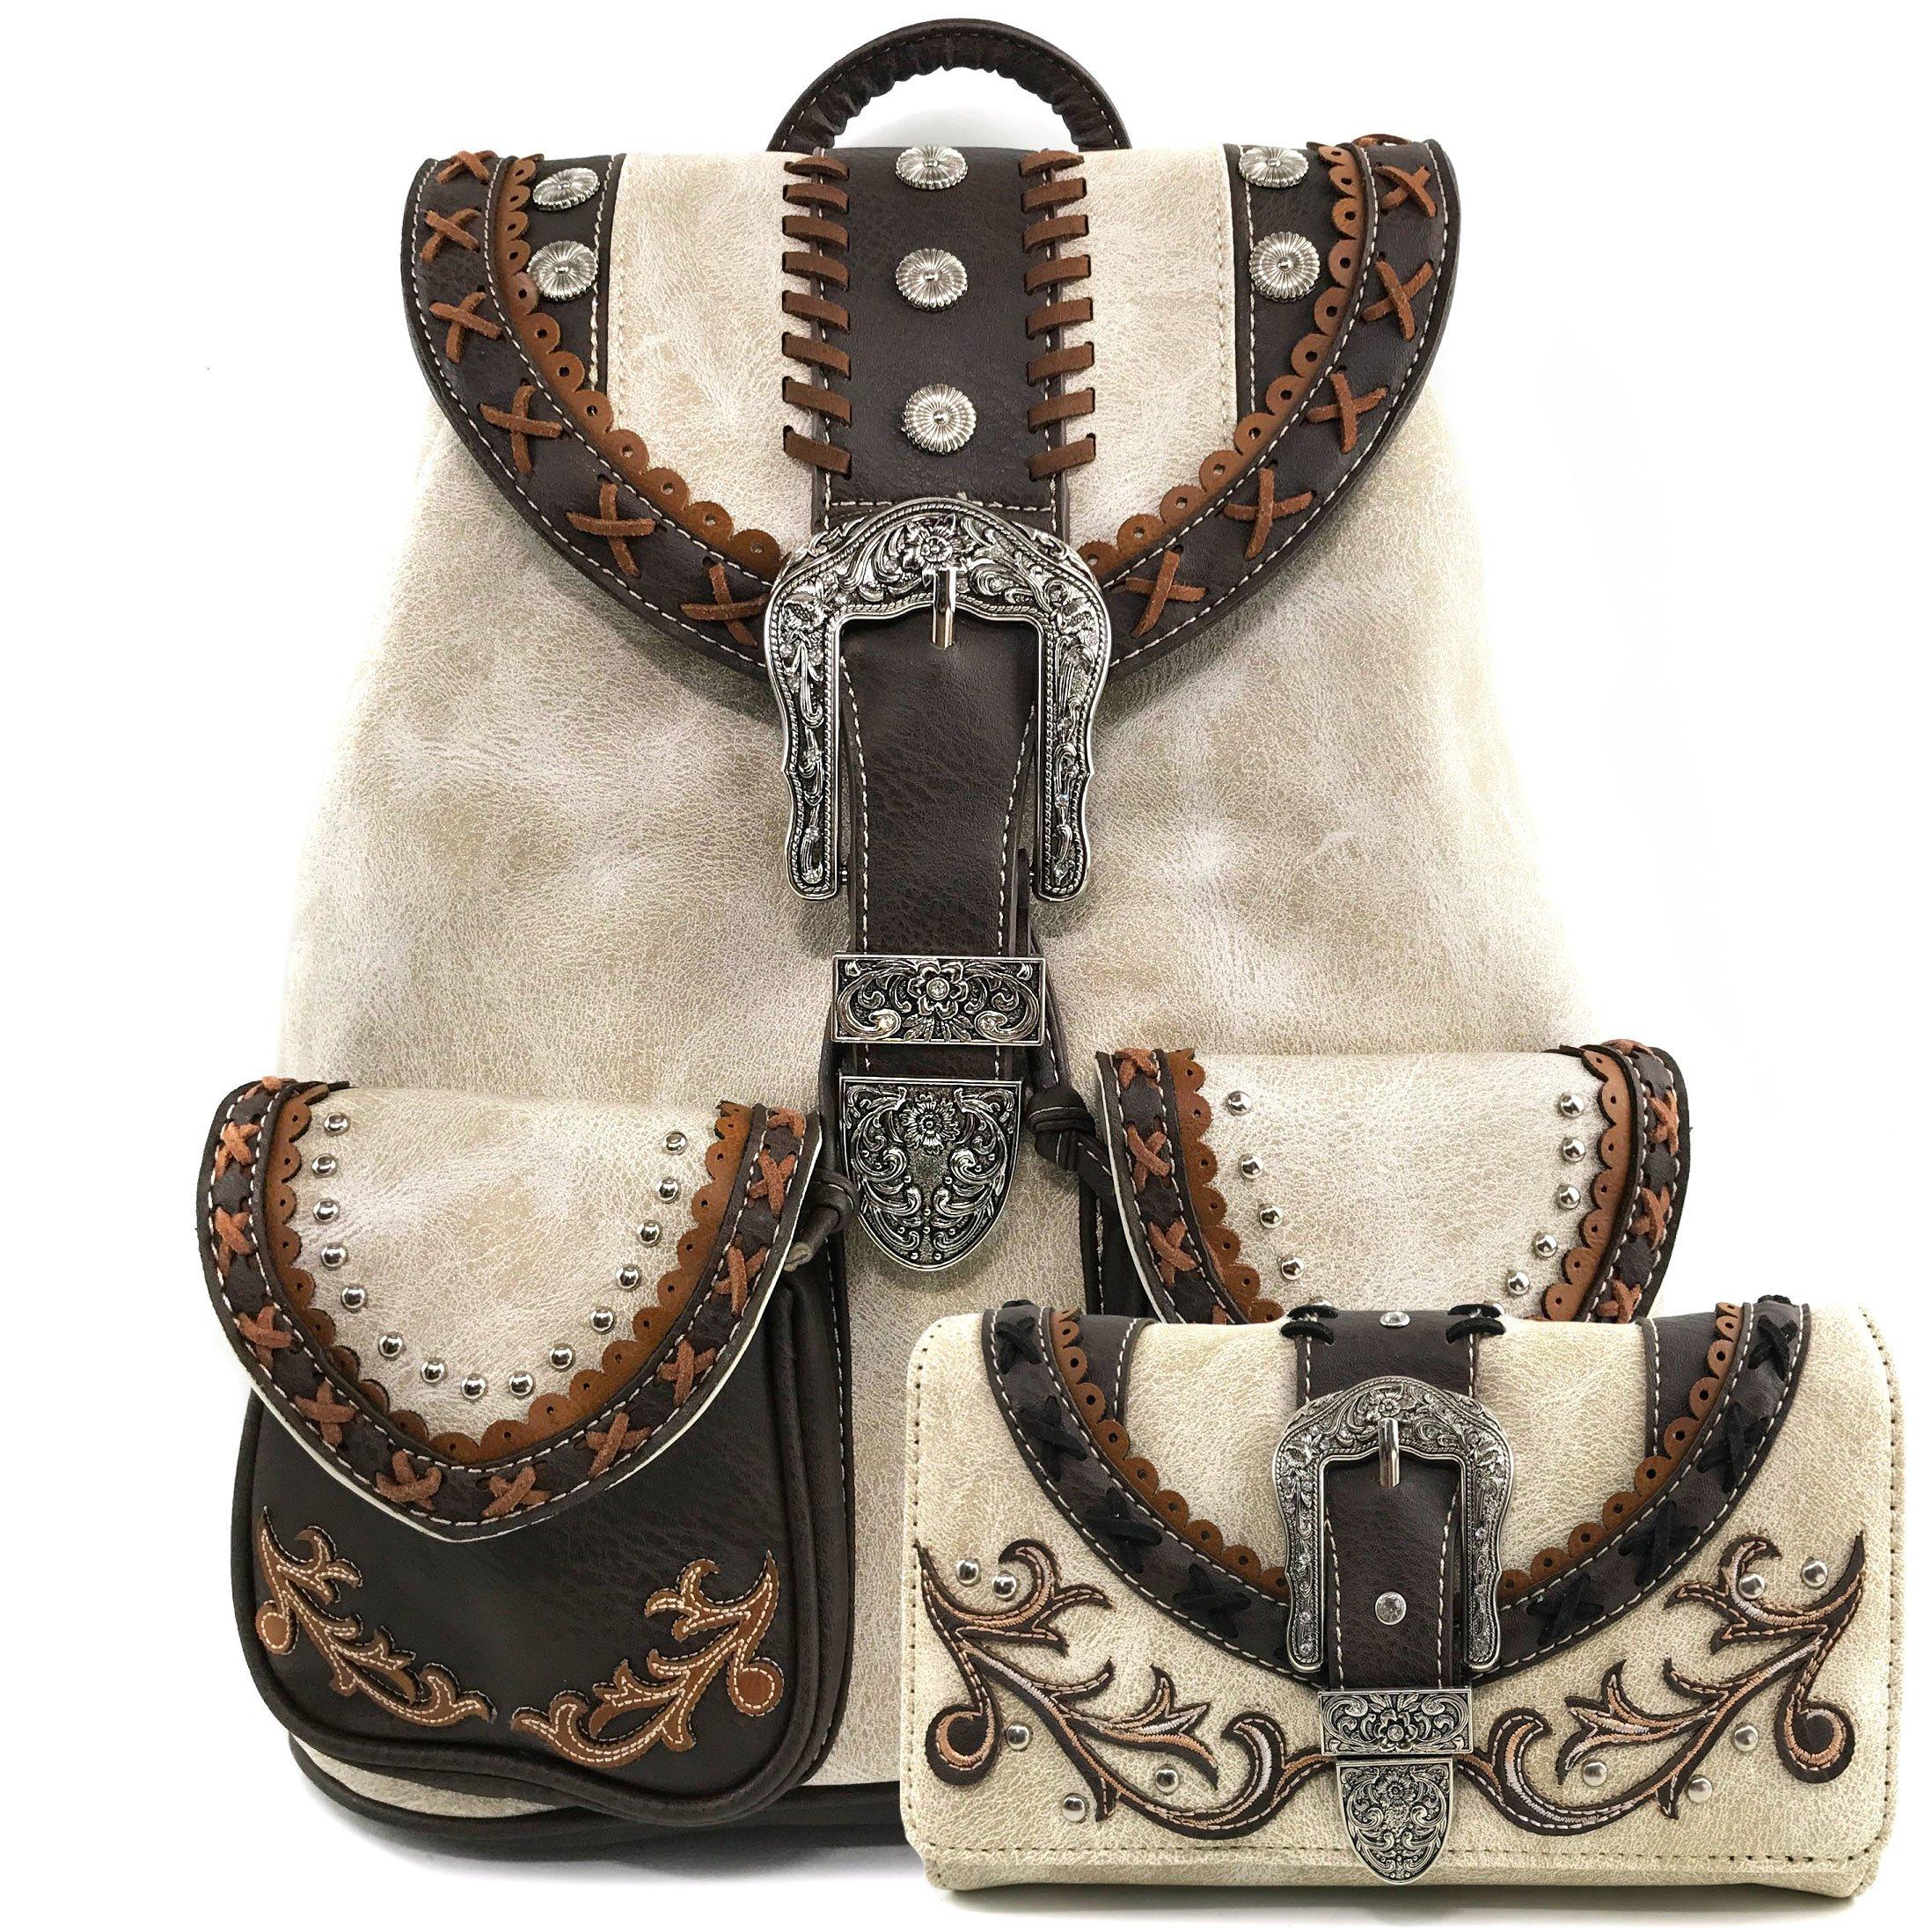 Justin West Trendy Western Rhinestone Leather Conceal Carry Top Handle Backpack Purse (Western Beige Backpack Wallet Set)